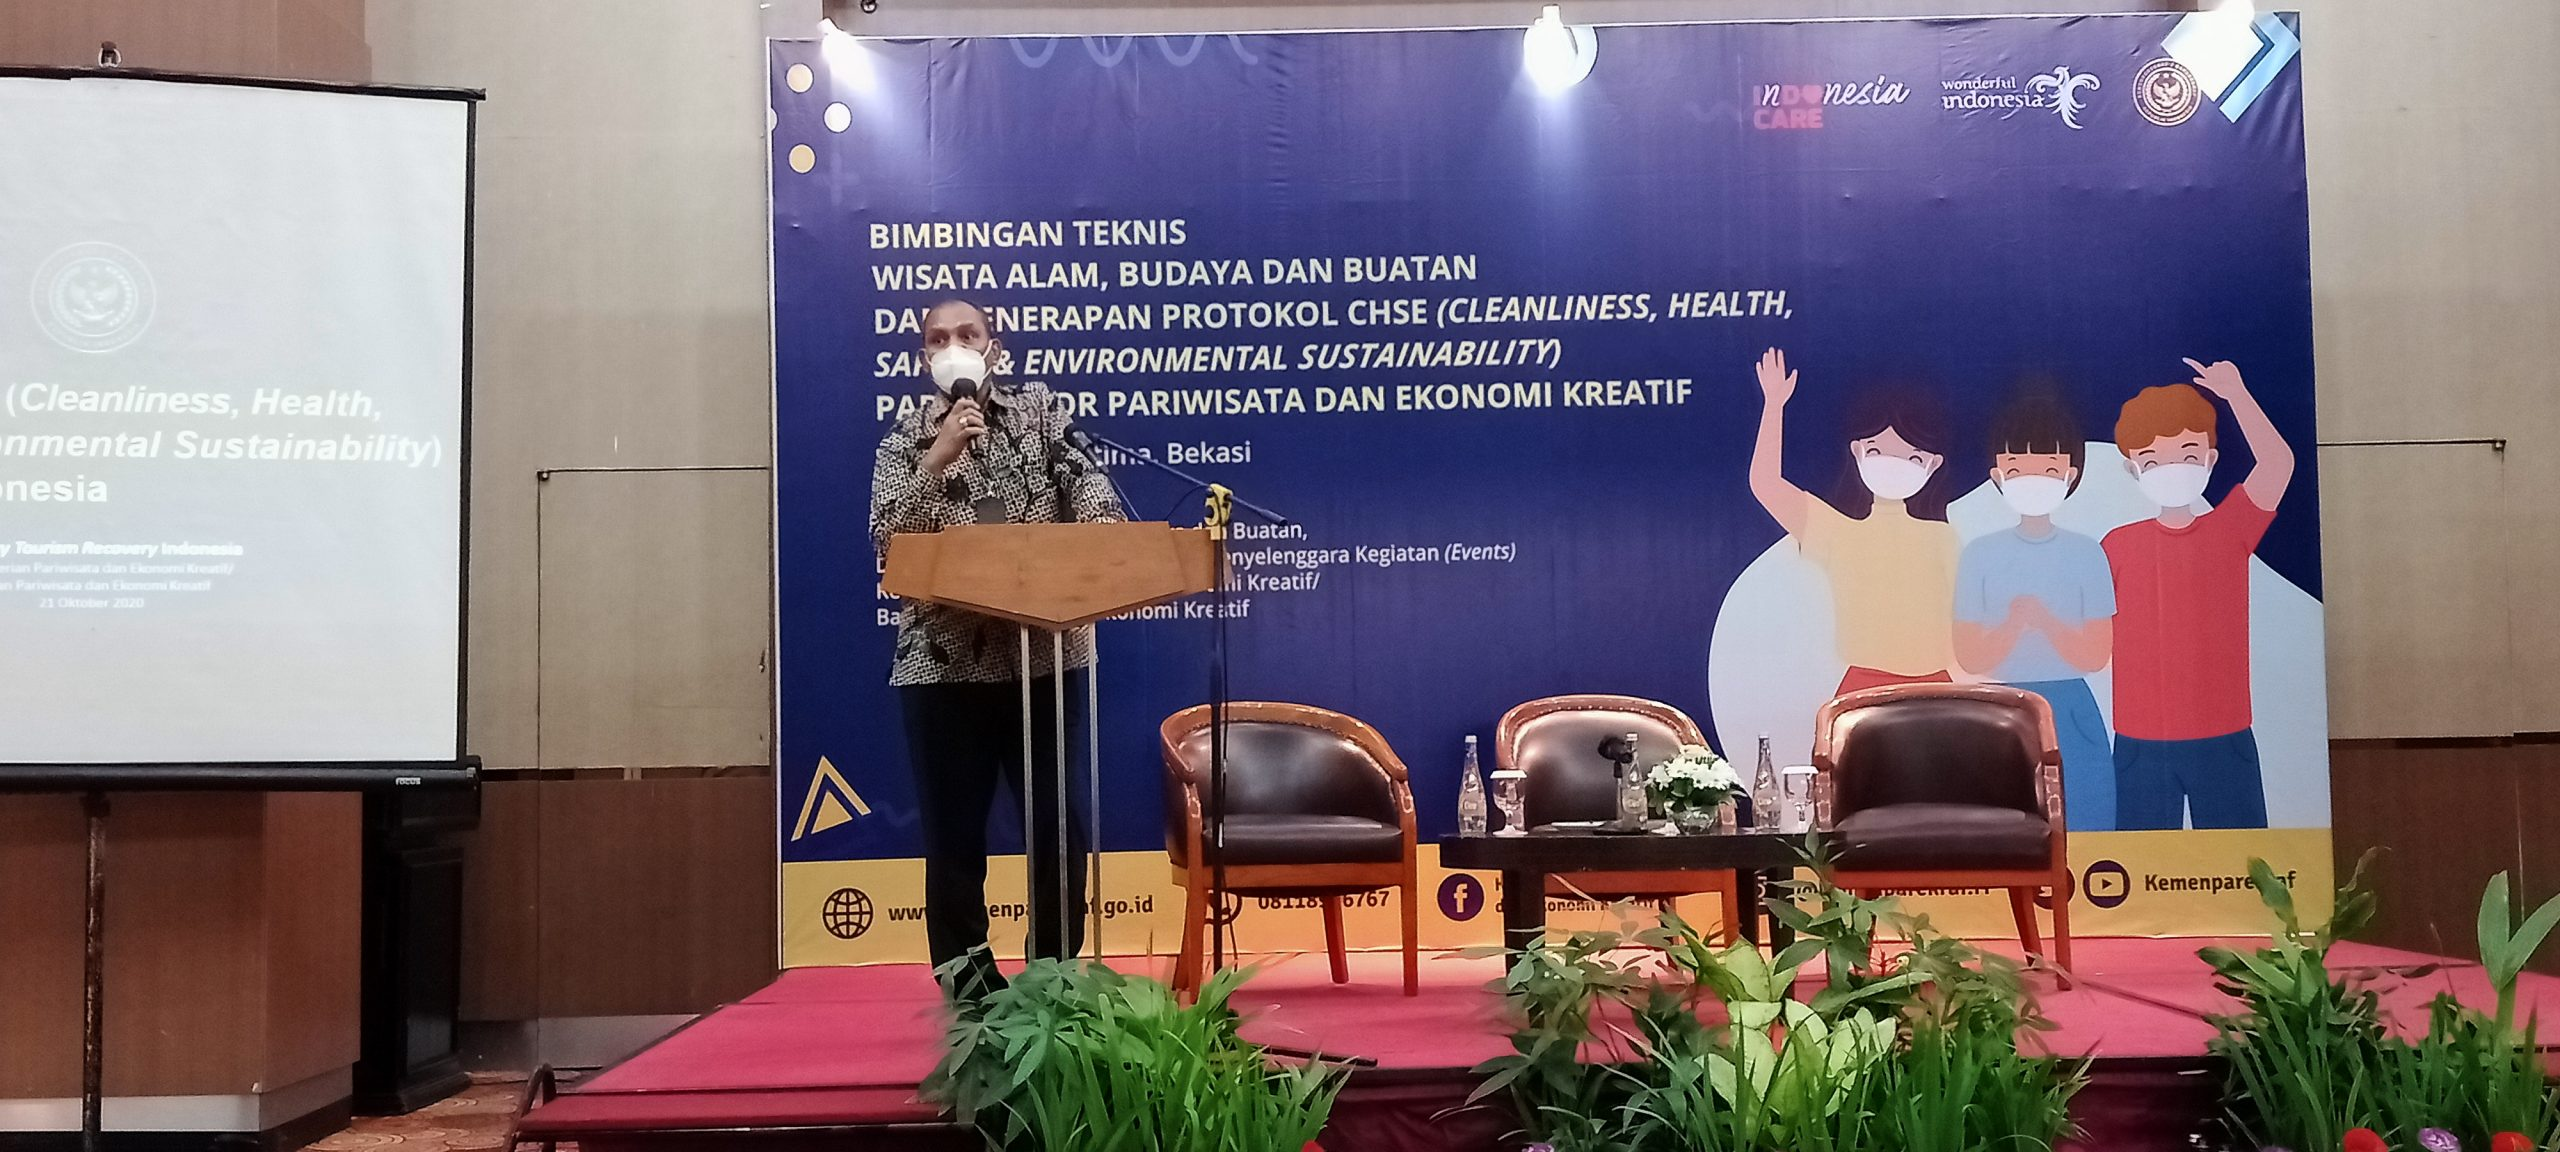 Direktur Wisata Alam, Budaya, dan Buatan Kemenparekraf/Baparekraf, Alexander Reyaan, Rabu (21/10).